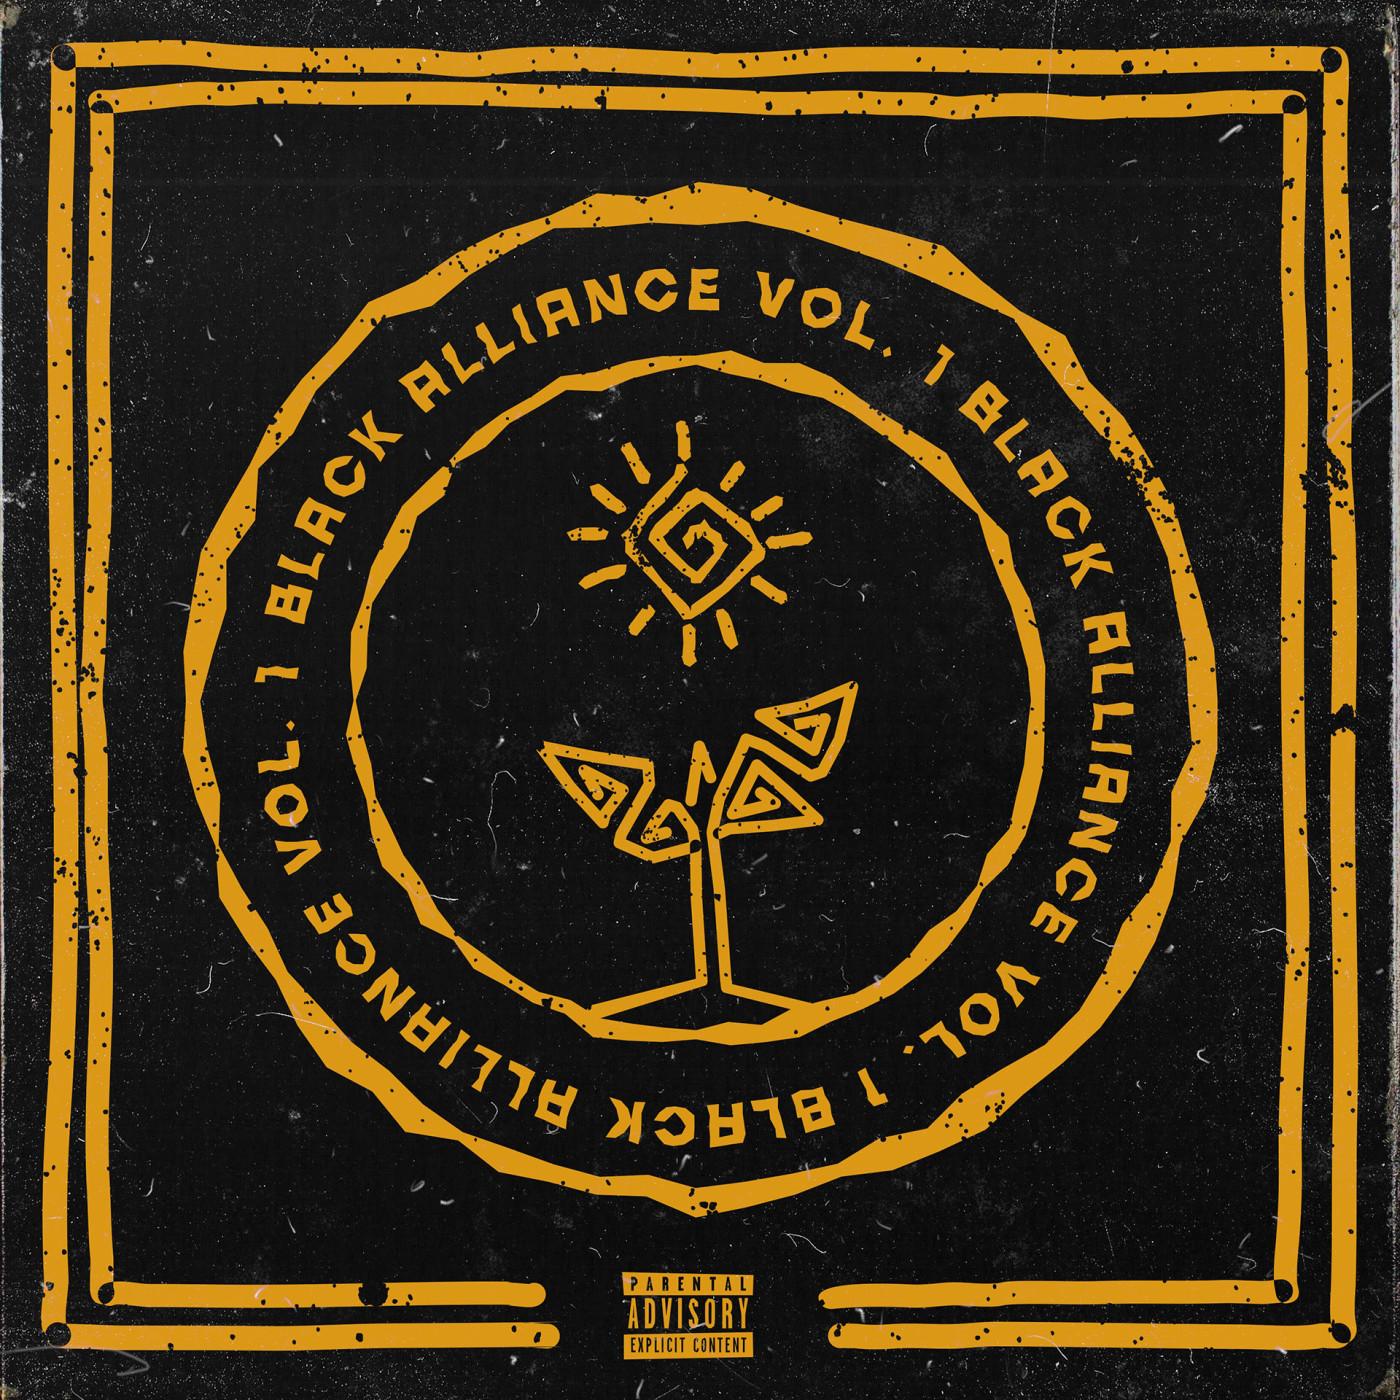 Charmaine, Amaal, and Jacksoul Reimagine Classics on 'Black Alliance Vol. 1'